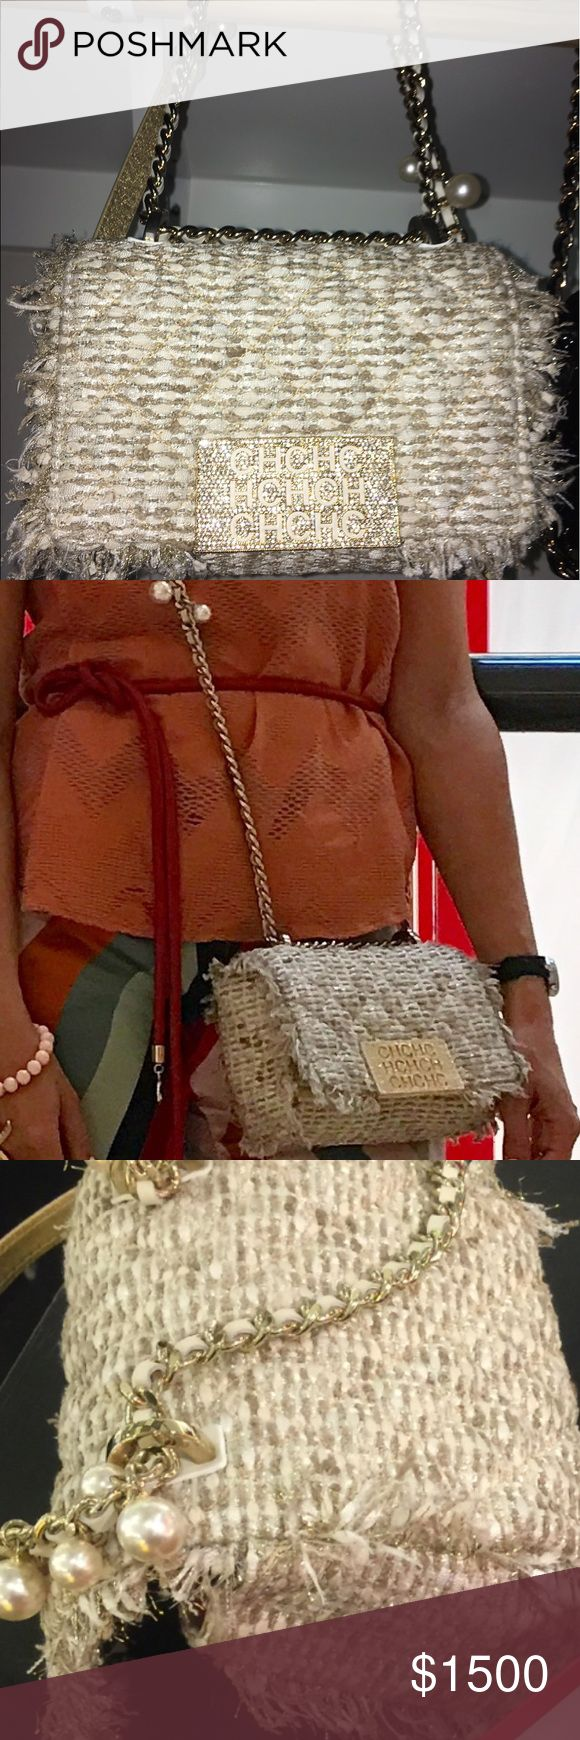 CH Carolina Herrera beige bag (Chanel style) Pre-loved condition, looks like new Carolina Herrera Bags Crossbody Bags